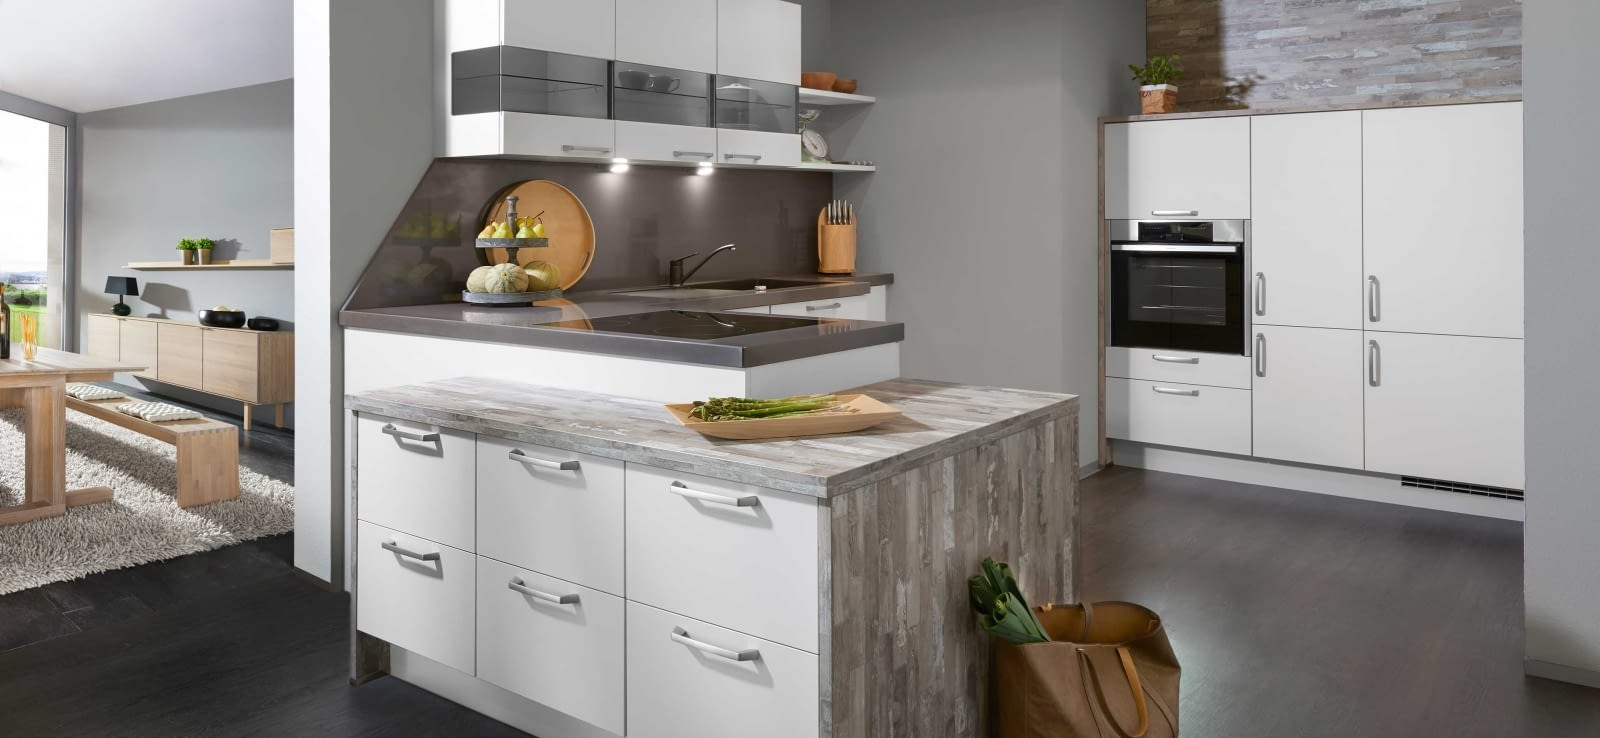 klassische l k che laser seidengrau mit gris anthacita. Black Bedroom Furniture Sets. Home Design Ideas